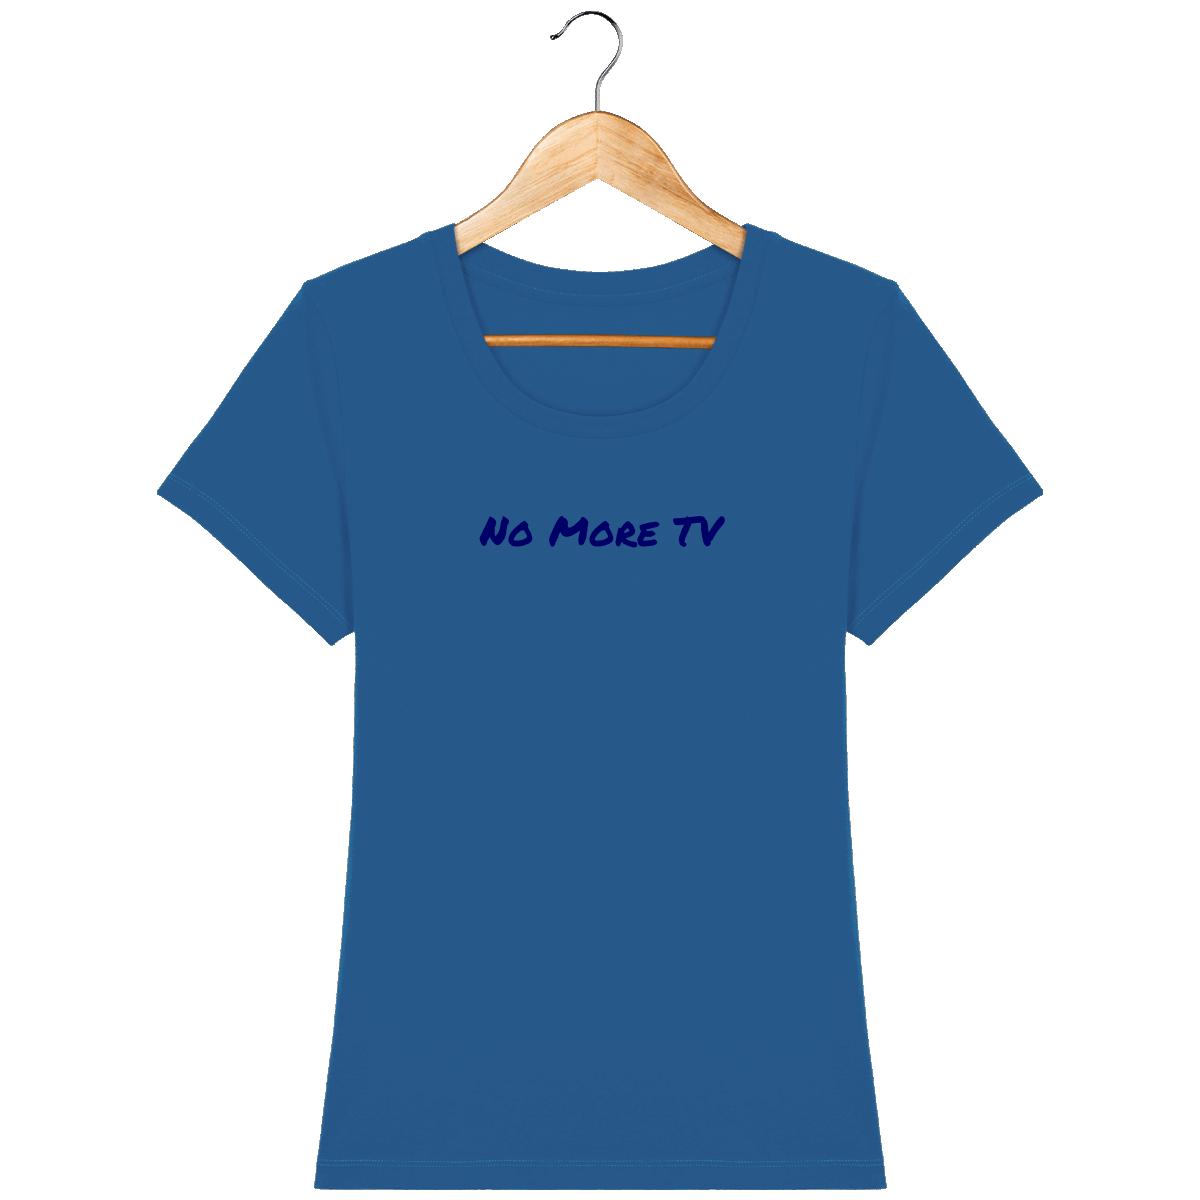 tee-shirt-bio-brode-no-more-tv-white-navy_royal-blue_face